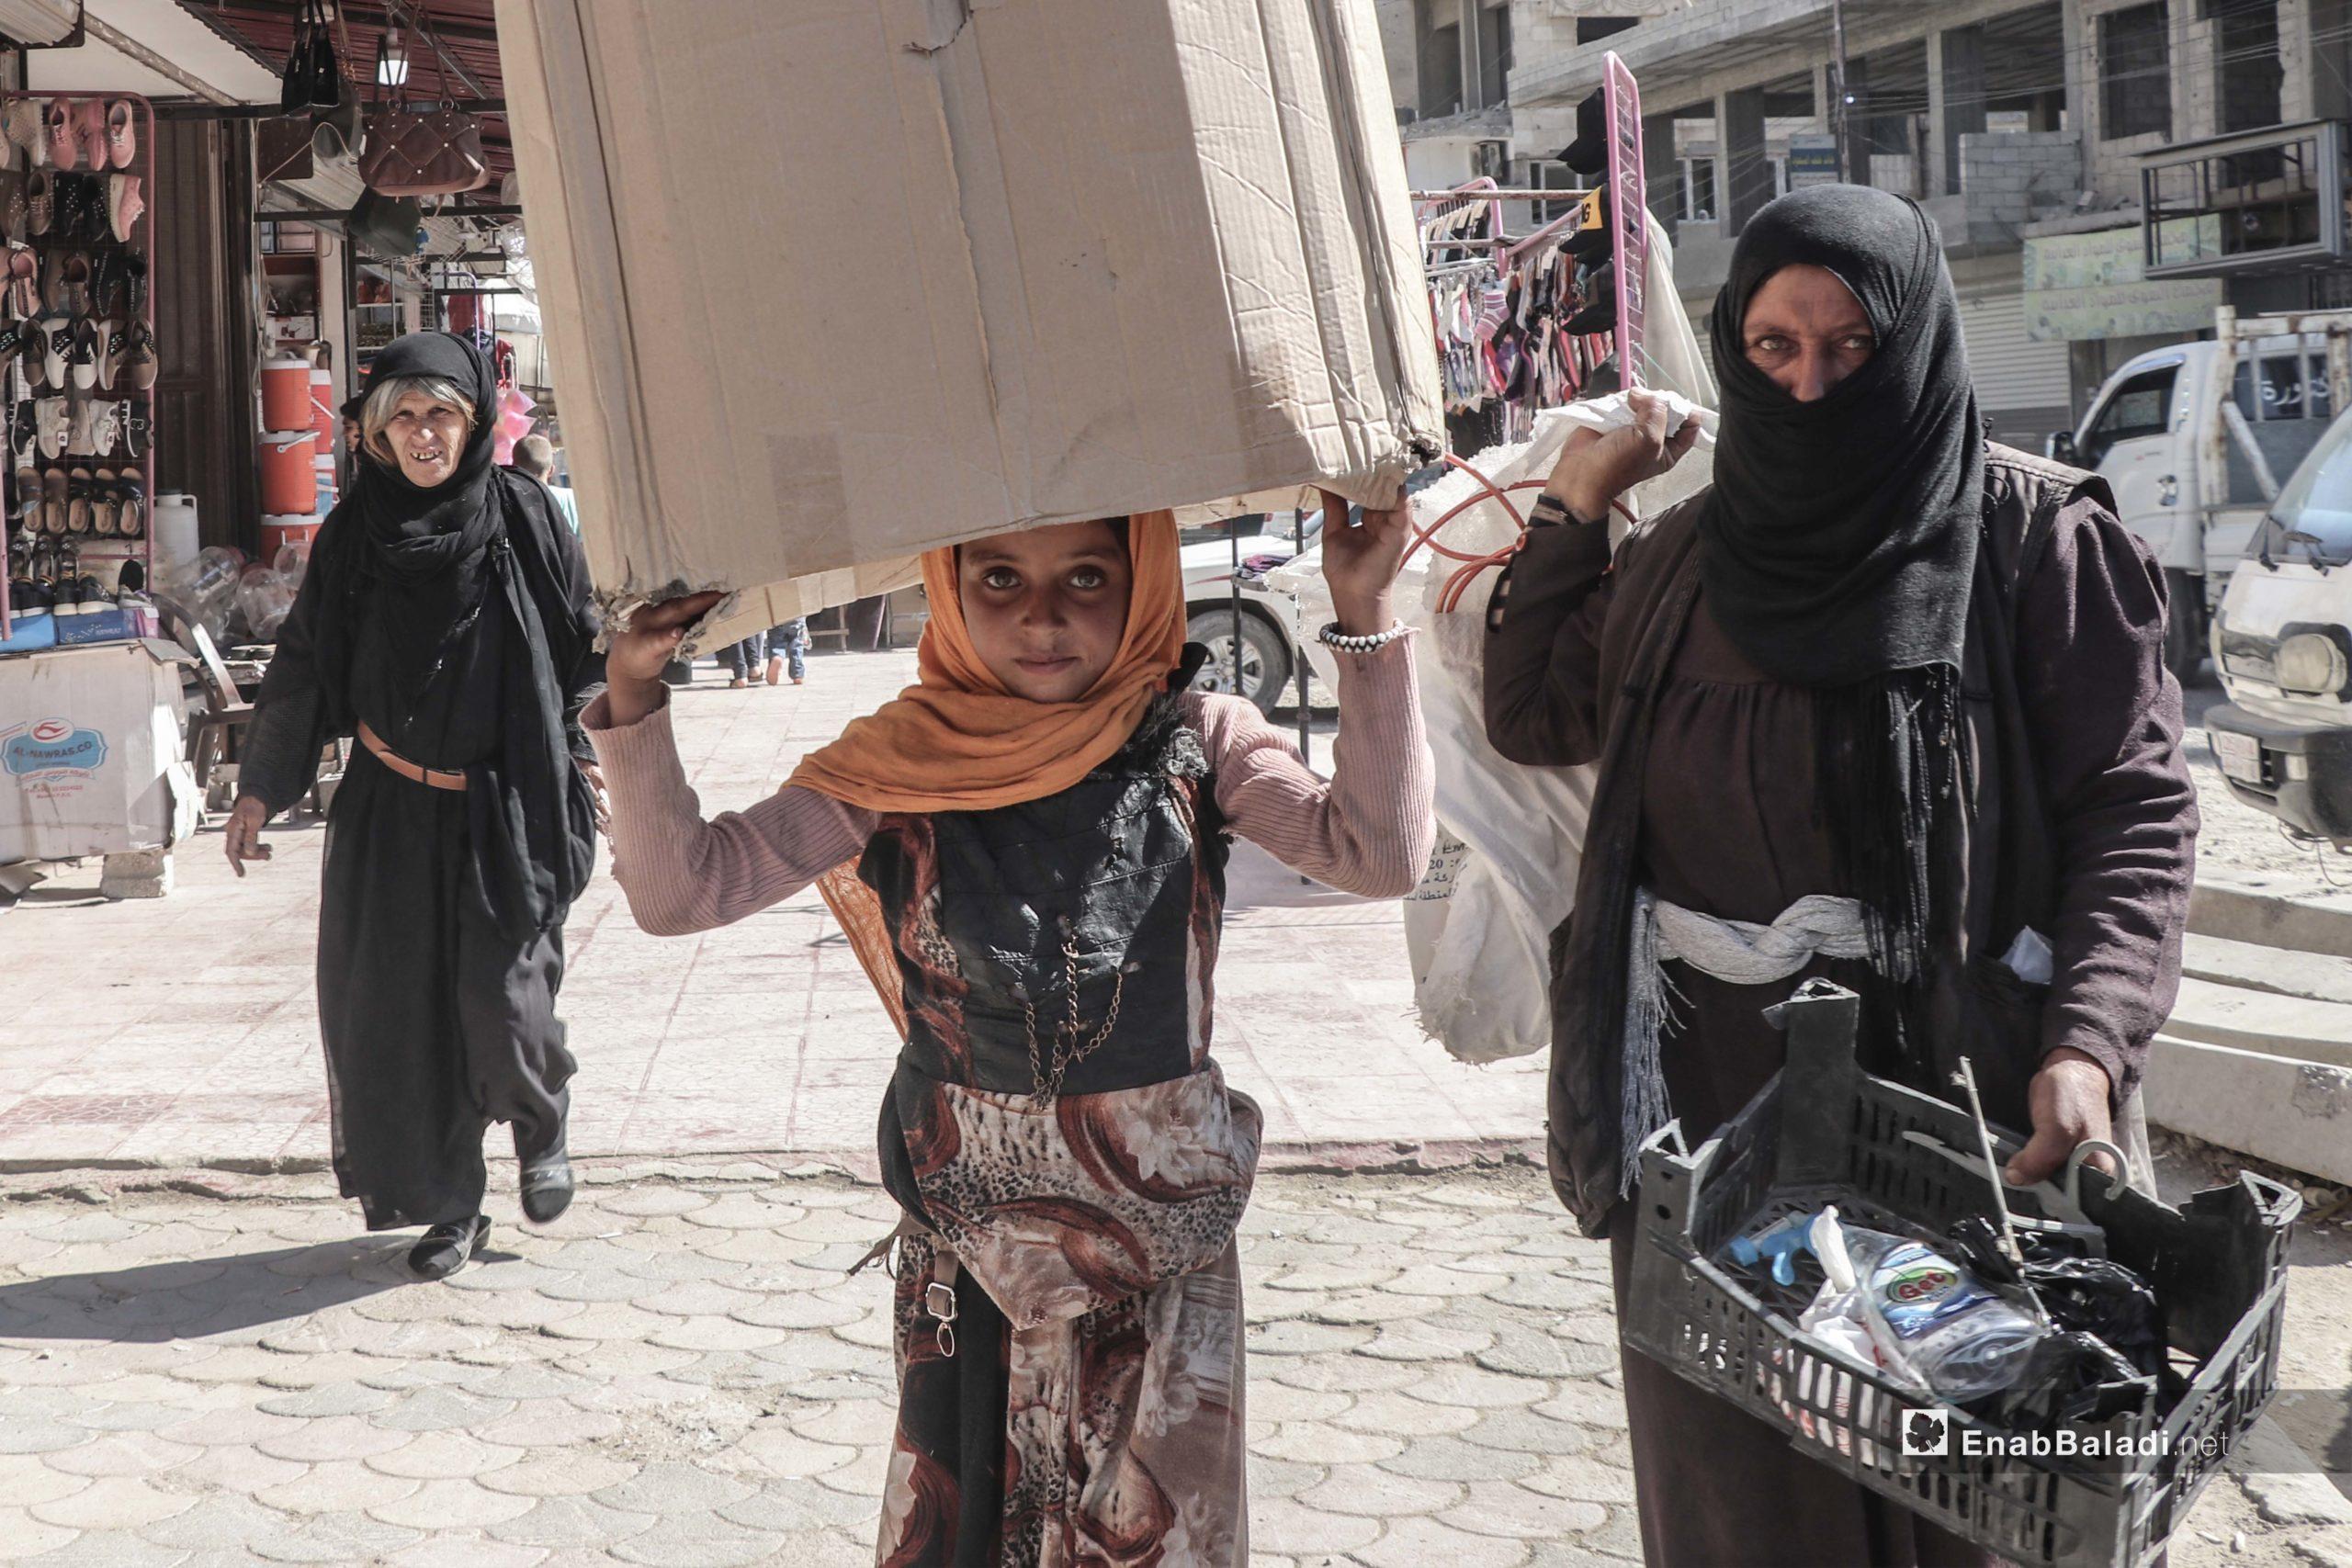 Child labor in al-Raqqa city's street markets in northern Syria – 05 June 2020 (Enab Baladi – Abdul Aziz al-Saleh)